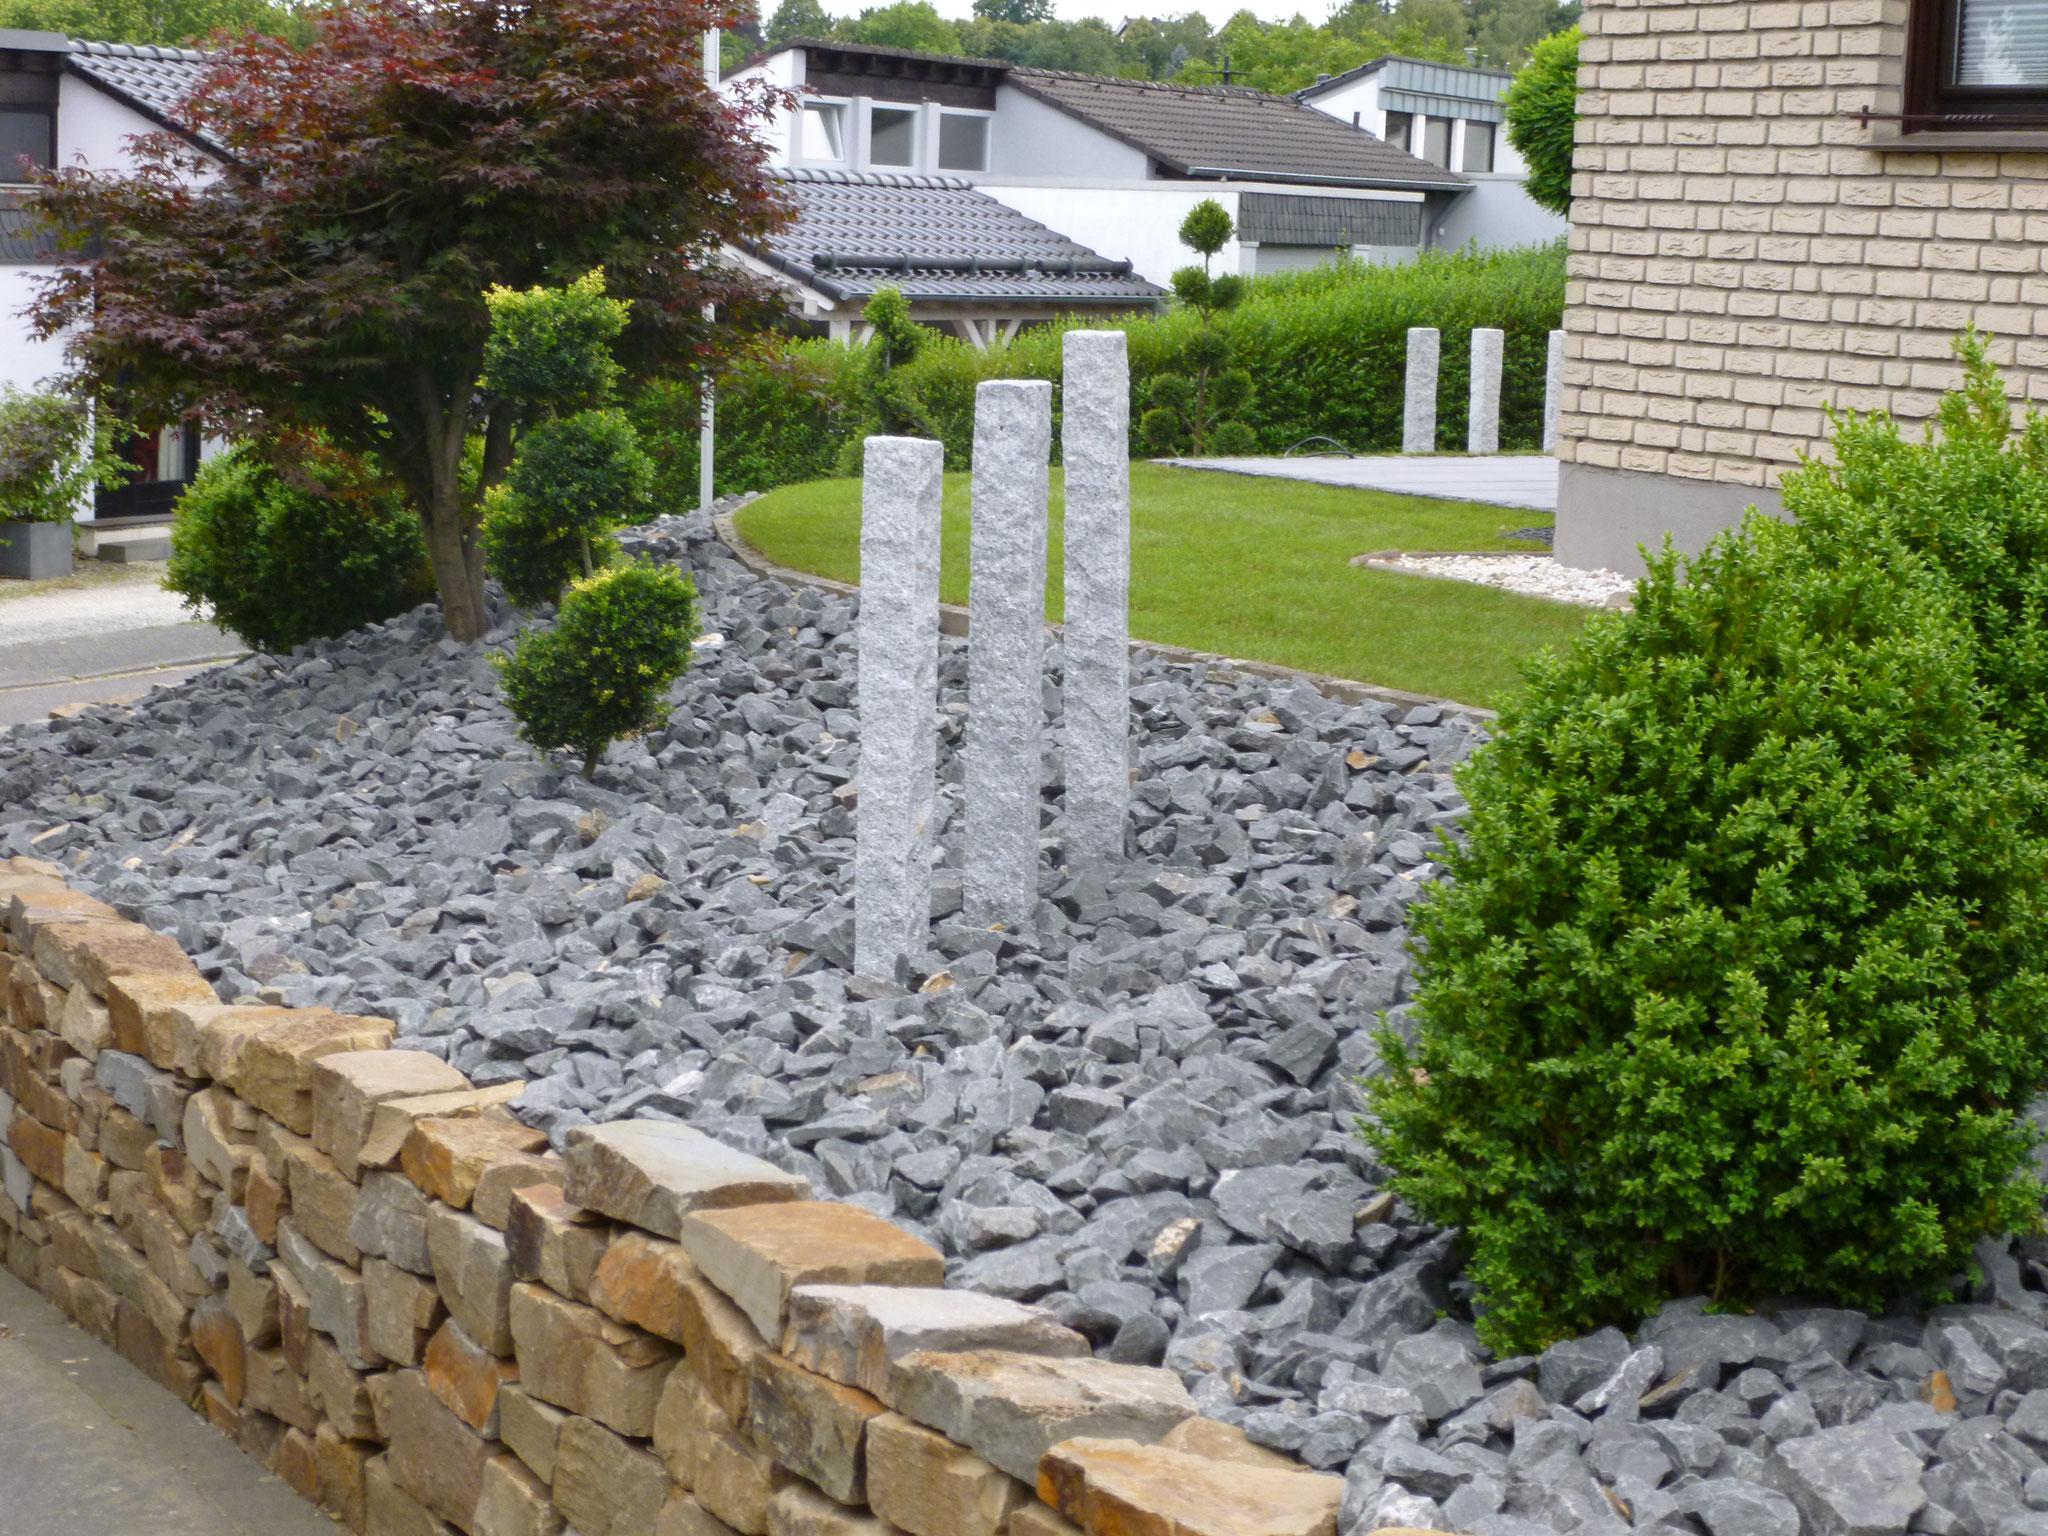 Gartengestaltung bmueller gartenbau webseite - Gartengestaltung app ...